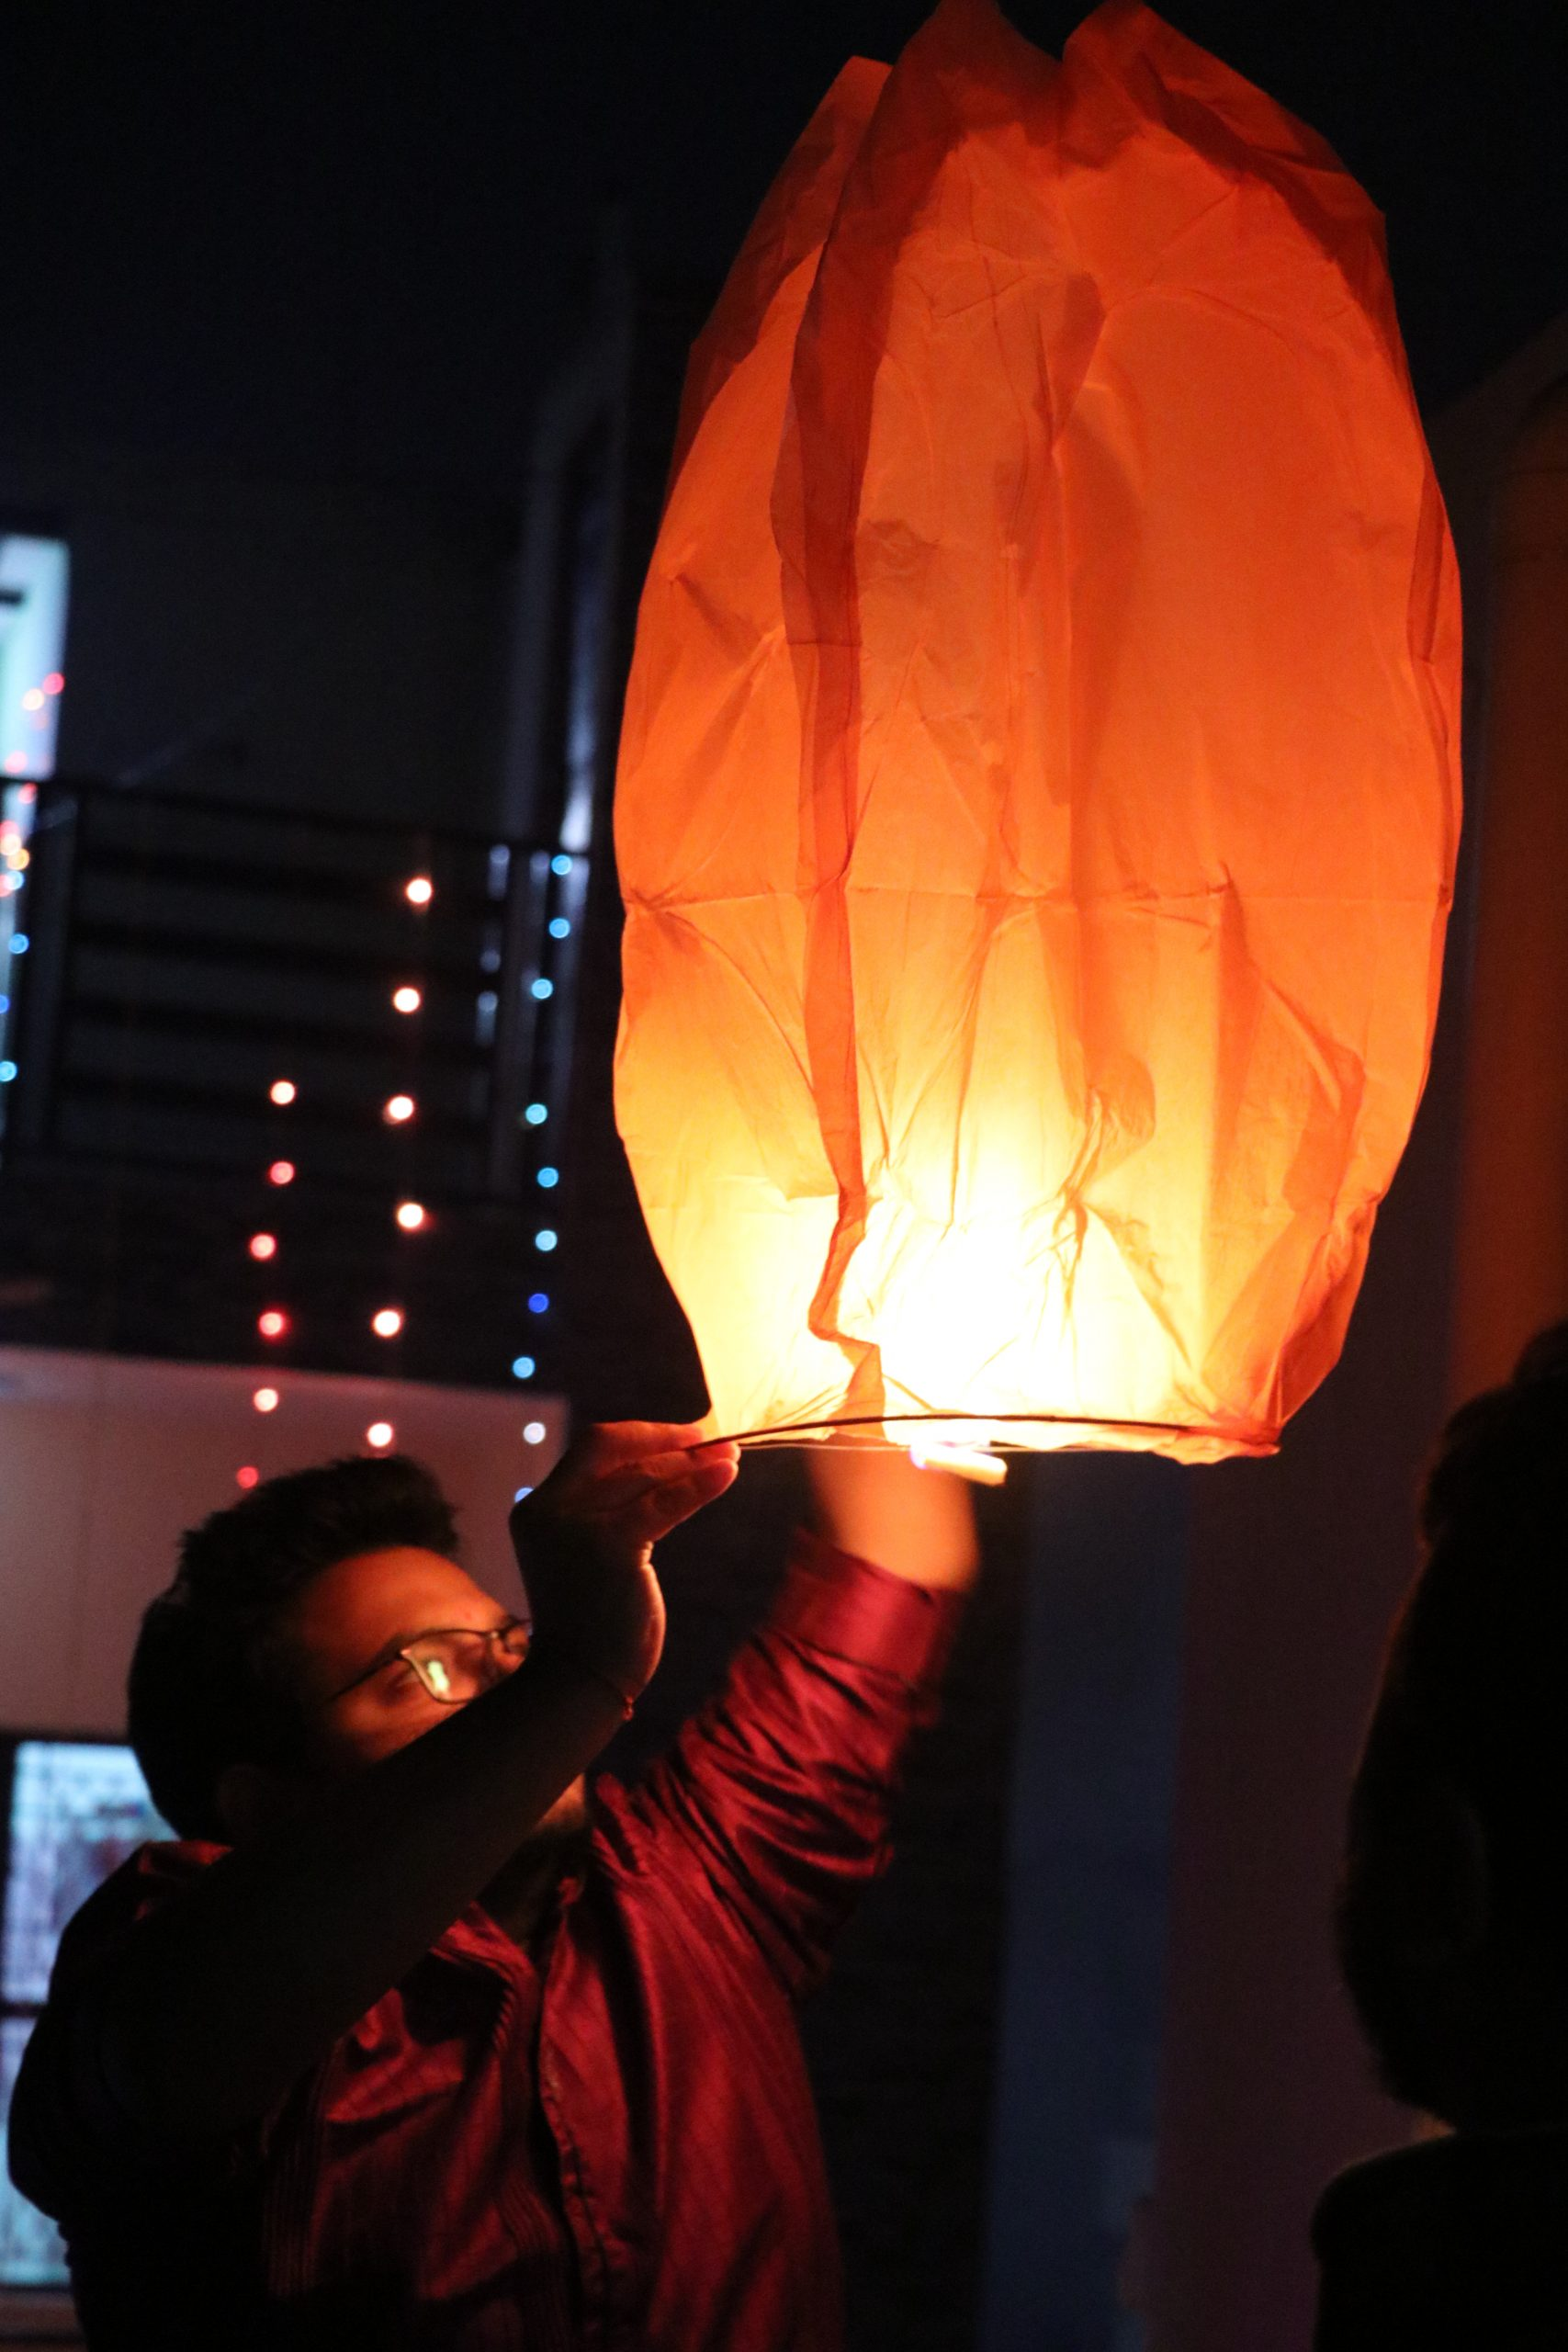 A boy with sky lantern